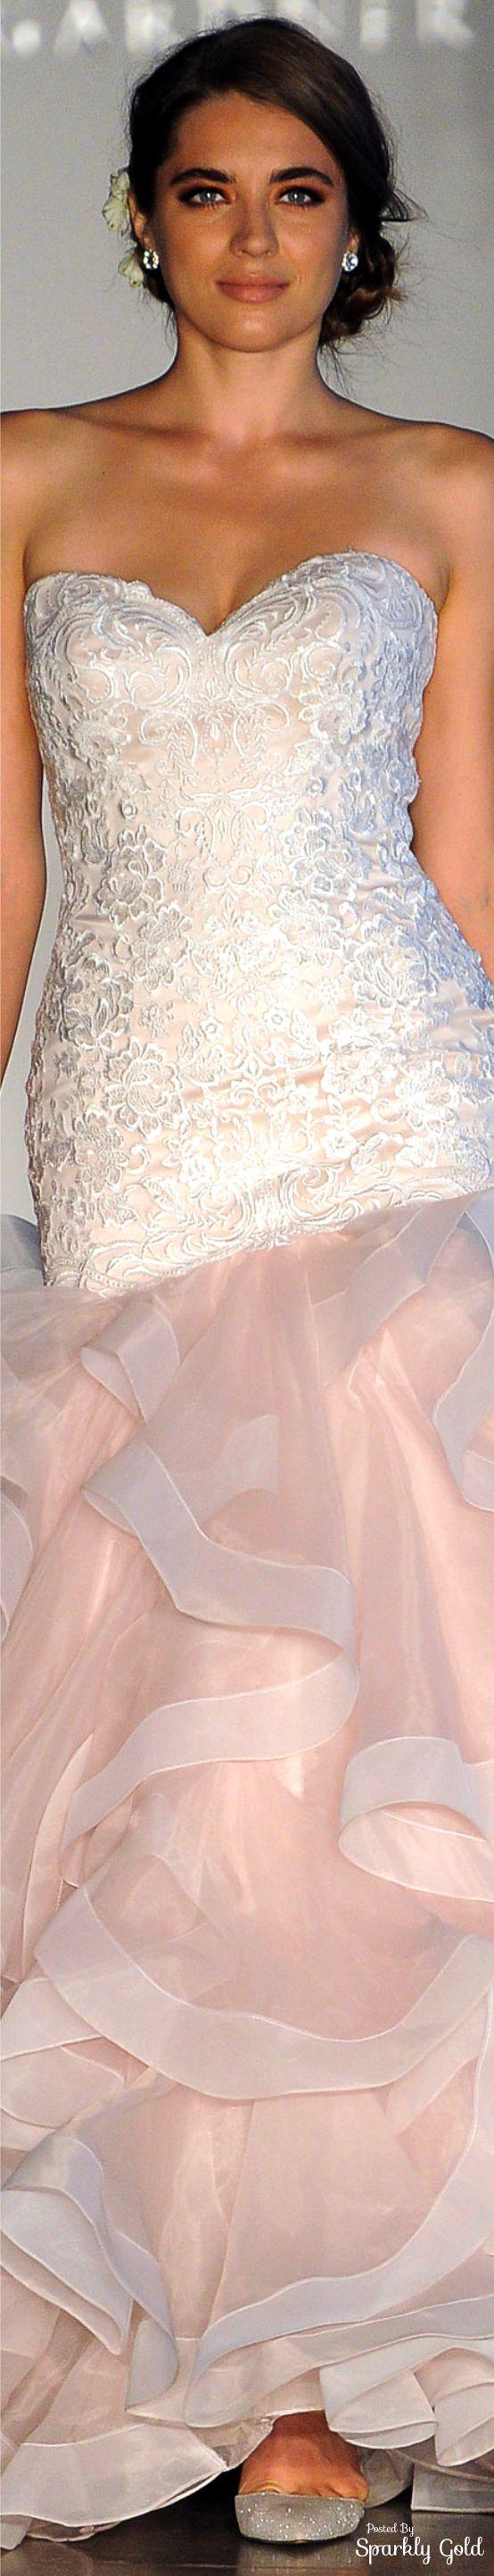 Morilee By Madeline Gardner Fall 2017 Bridal | Novia Bella ...